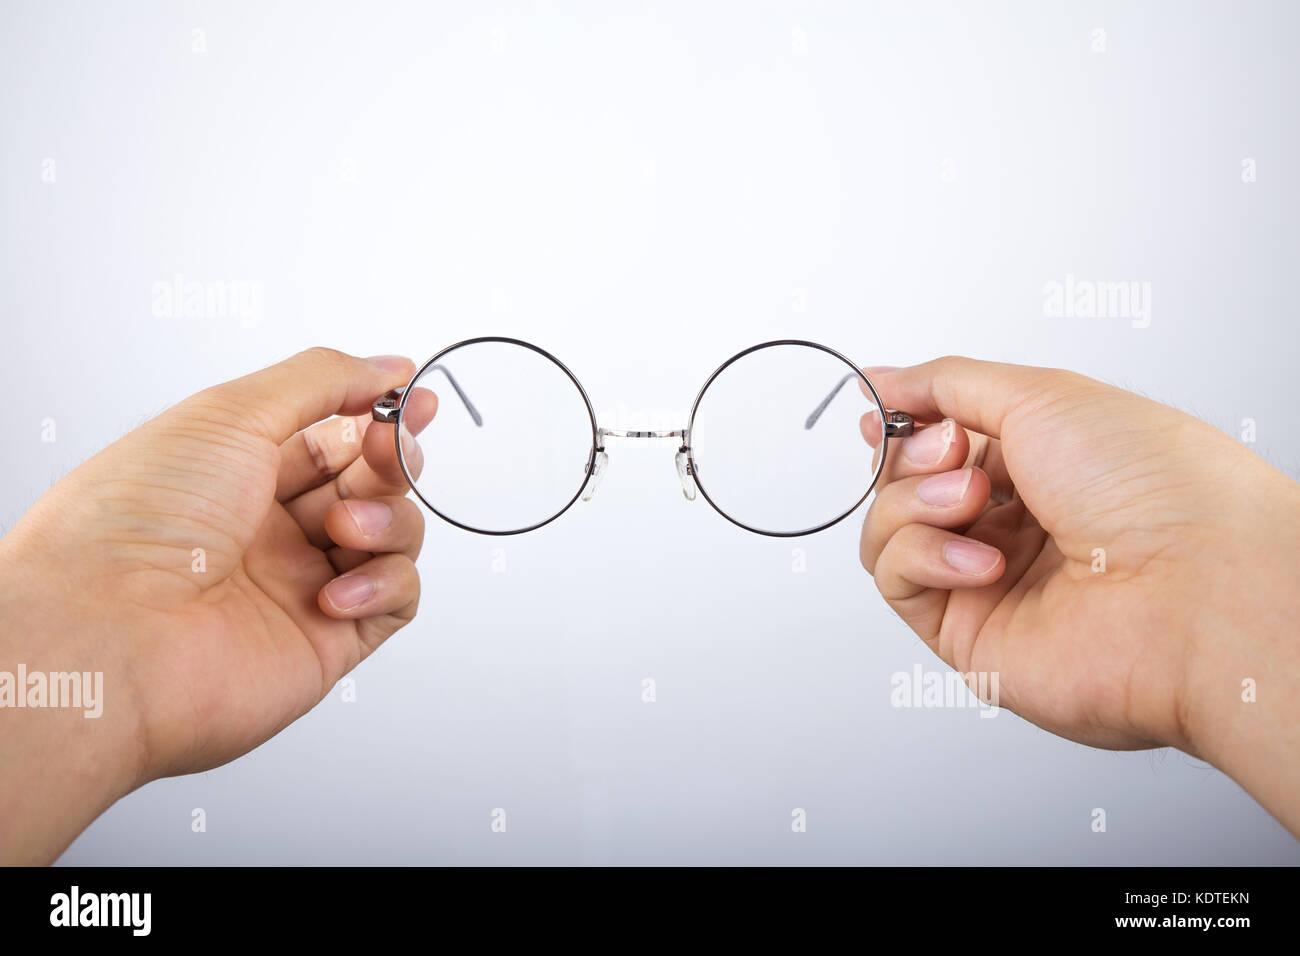 88089388c0335 hand holding circle glasses Stock Photo  163422217 - Alamy